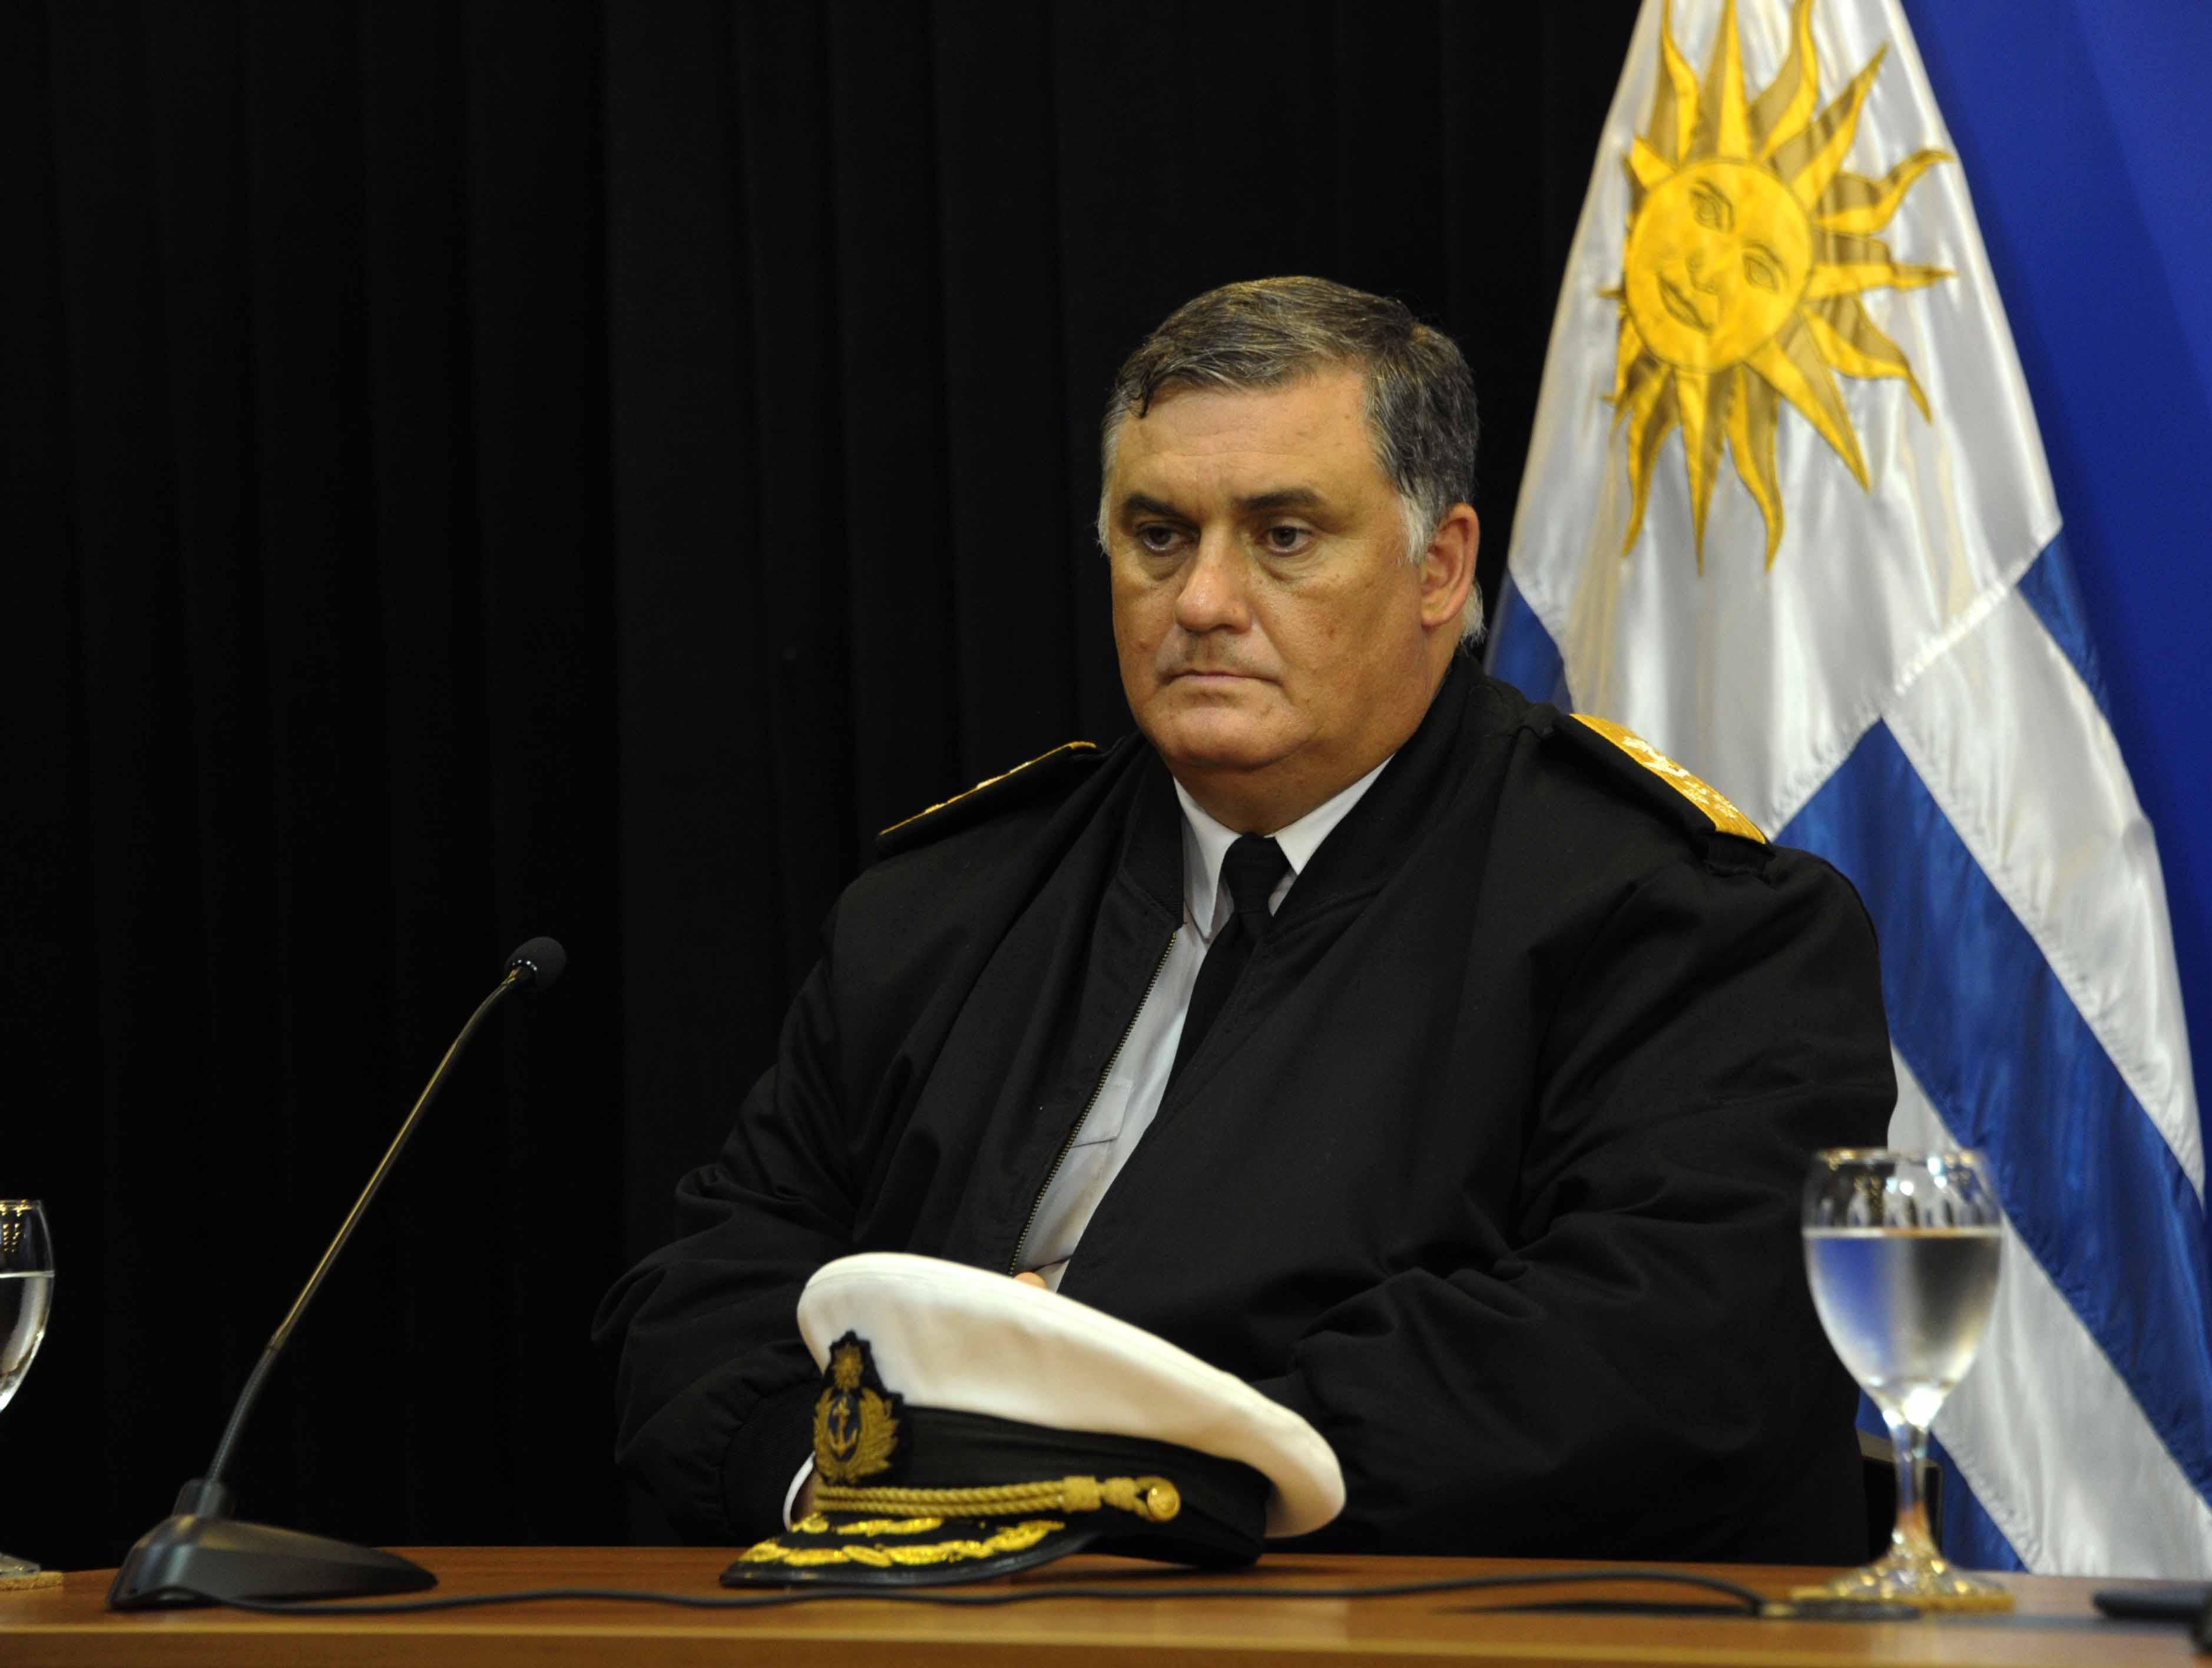 Comandante en jefe de la Armada Nacional, Jorge Wilson